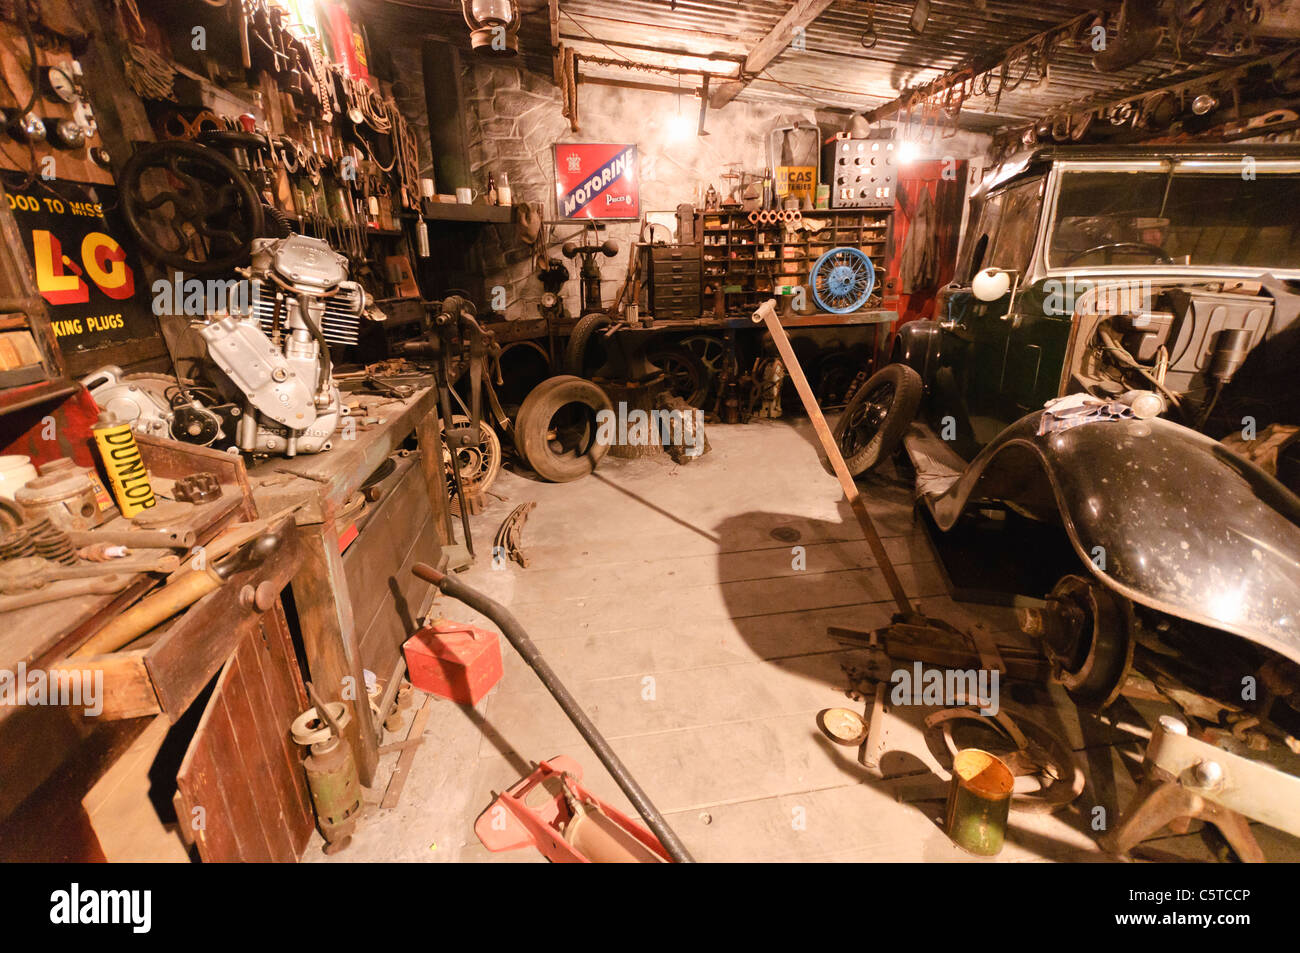 old garage workshop stock photos old garage workshop stock old fashioned mechanics workshop garage stock image